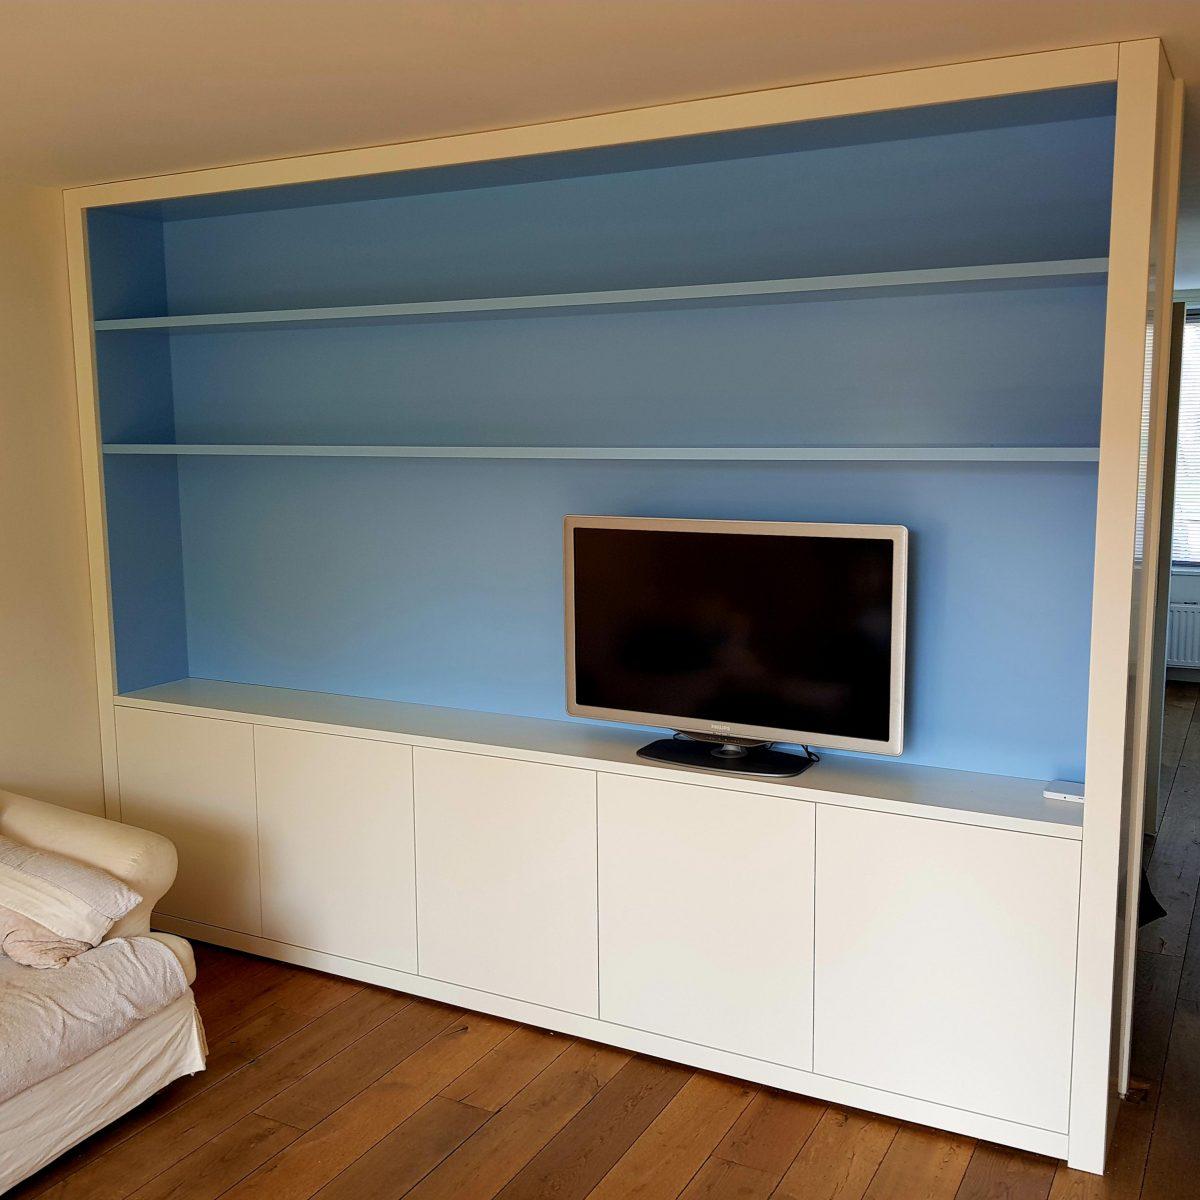 Witte kast met blauw binnenwerk.